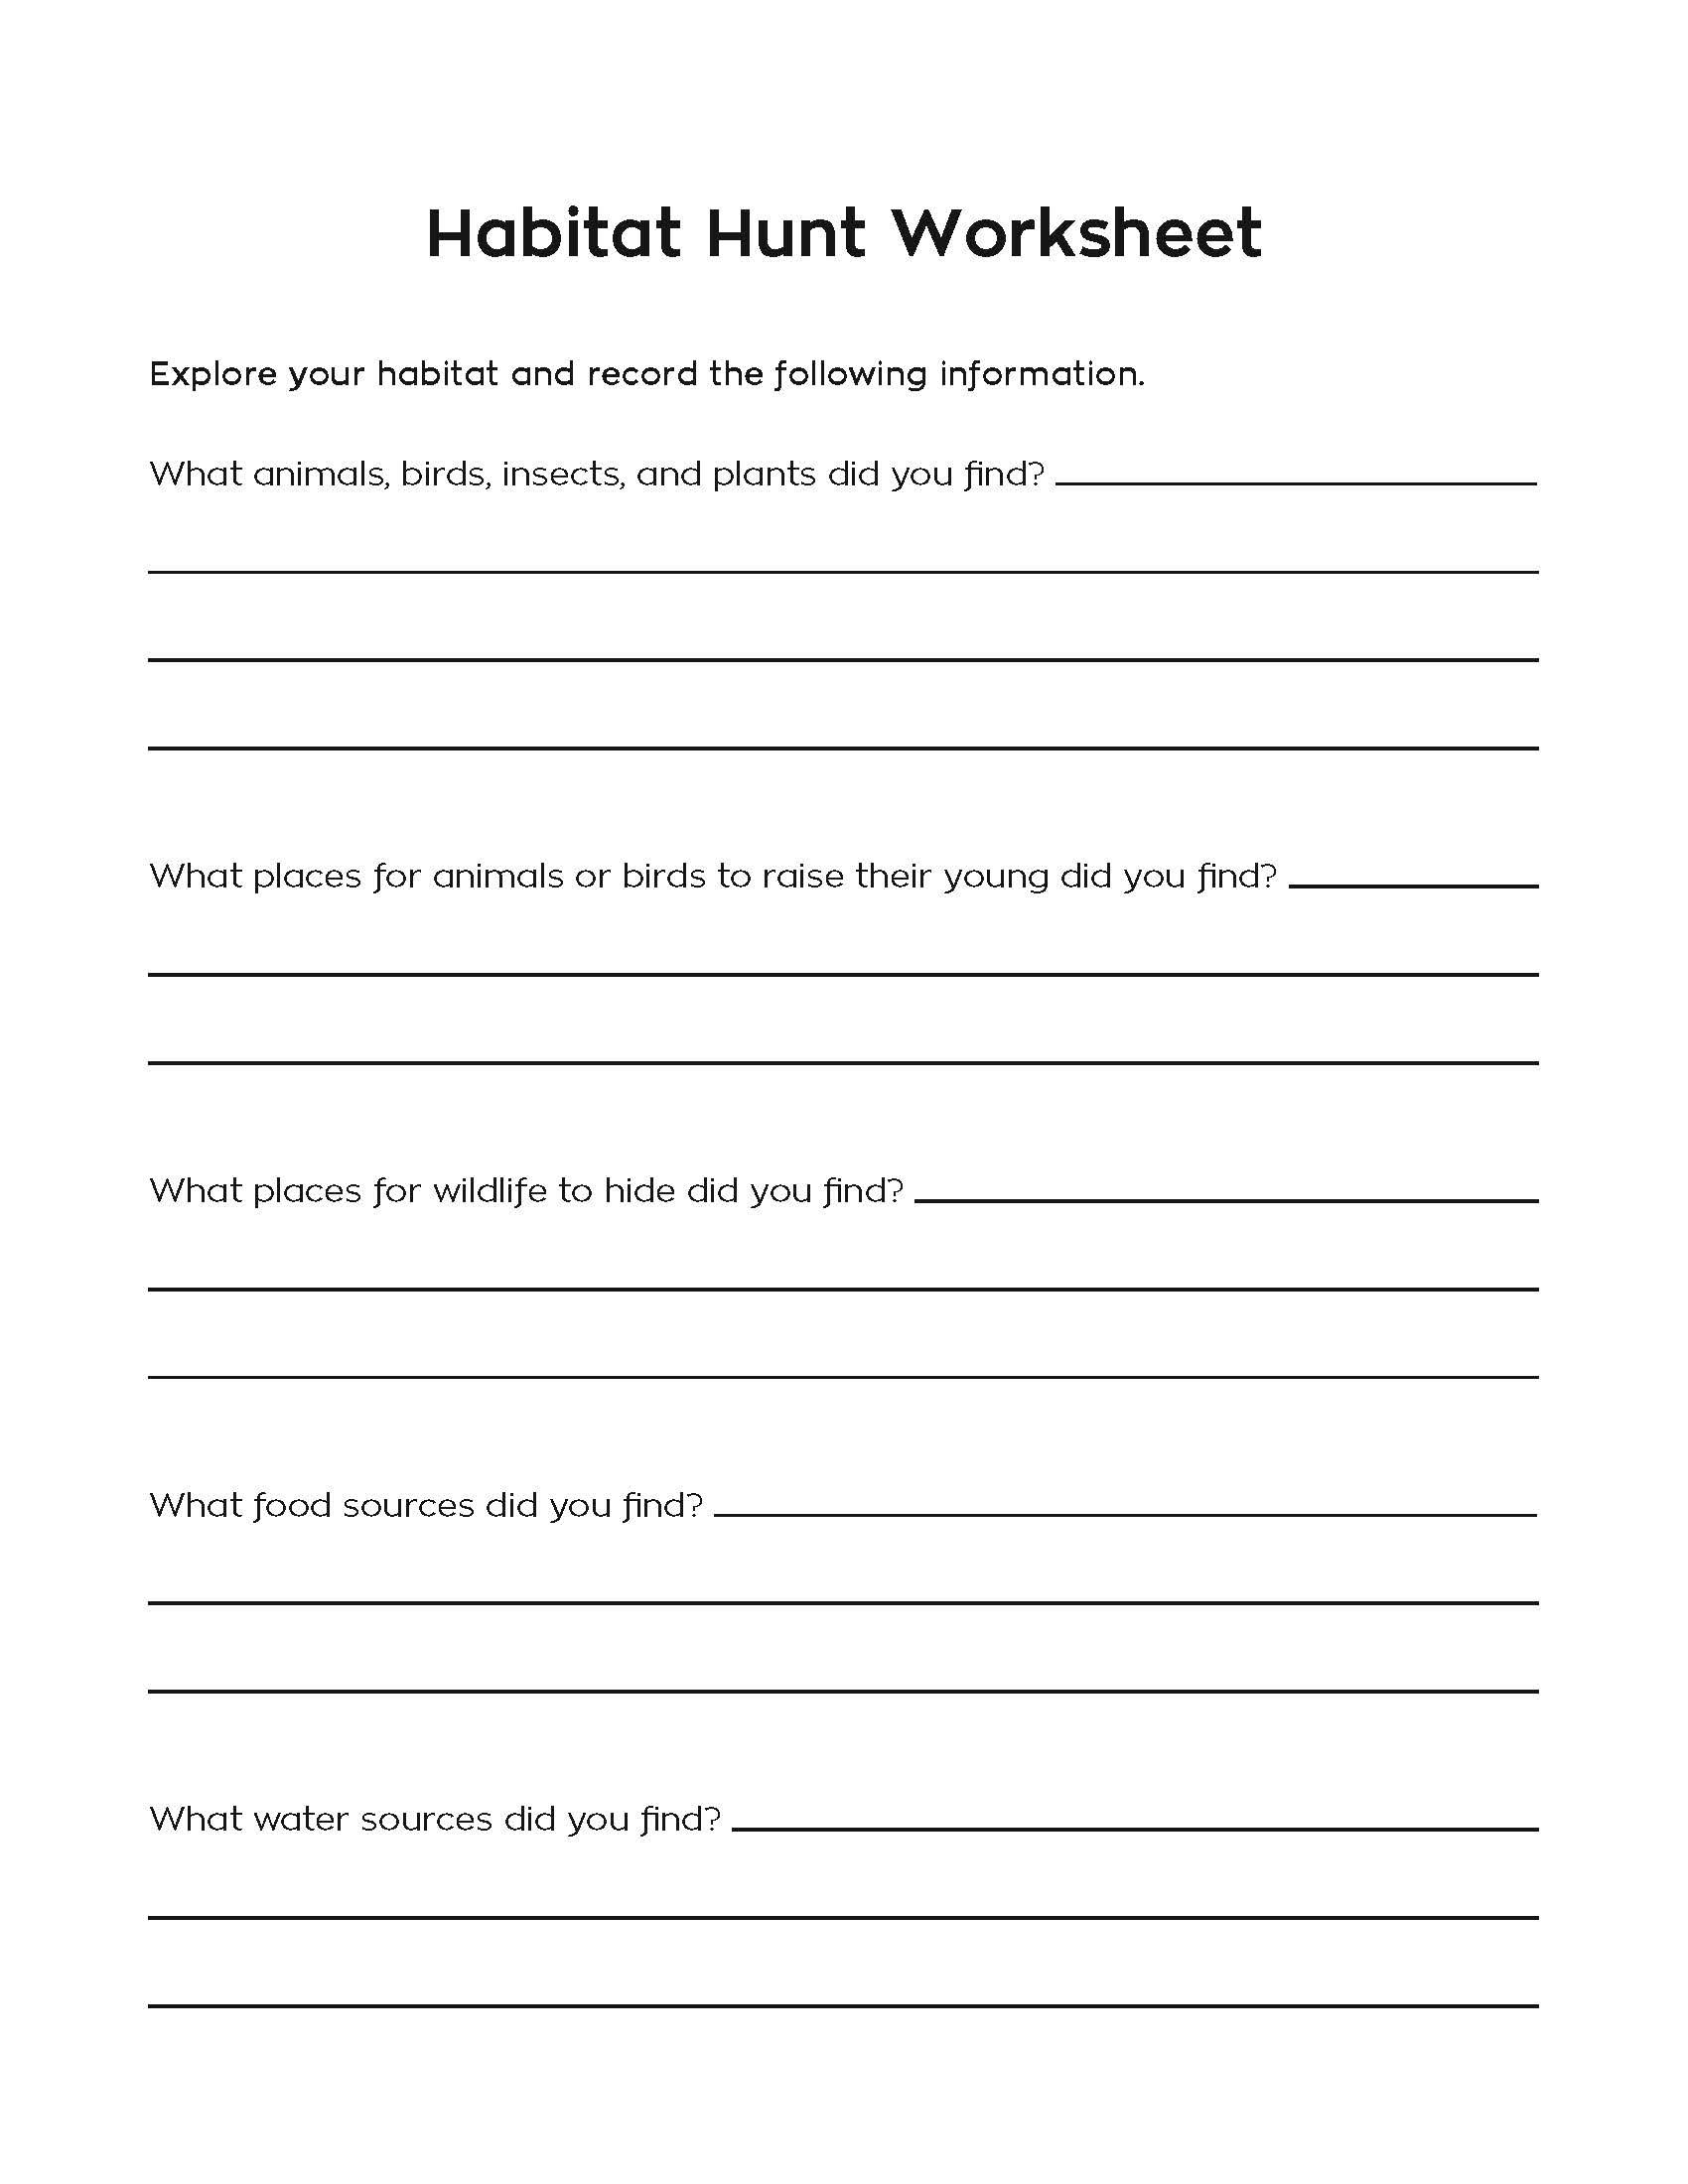 medium resolution of Meeting 12: Use this worksheet for your Habitat Hunt   Kids worksheets  printables